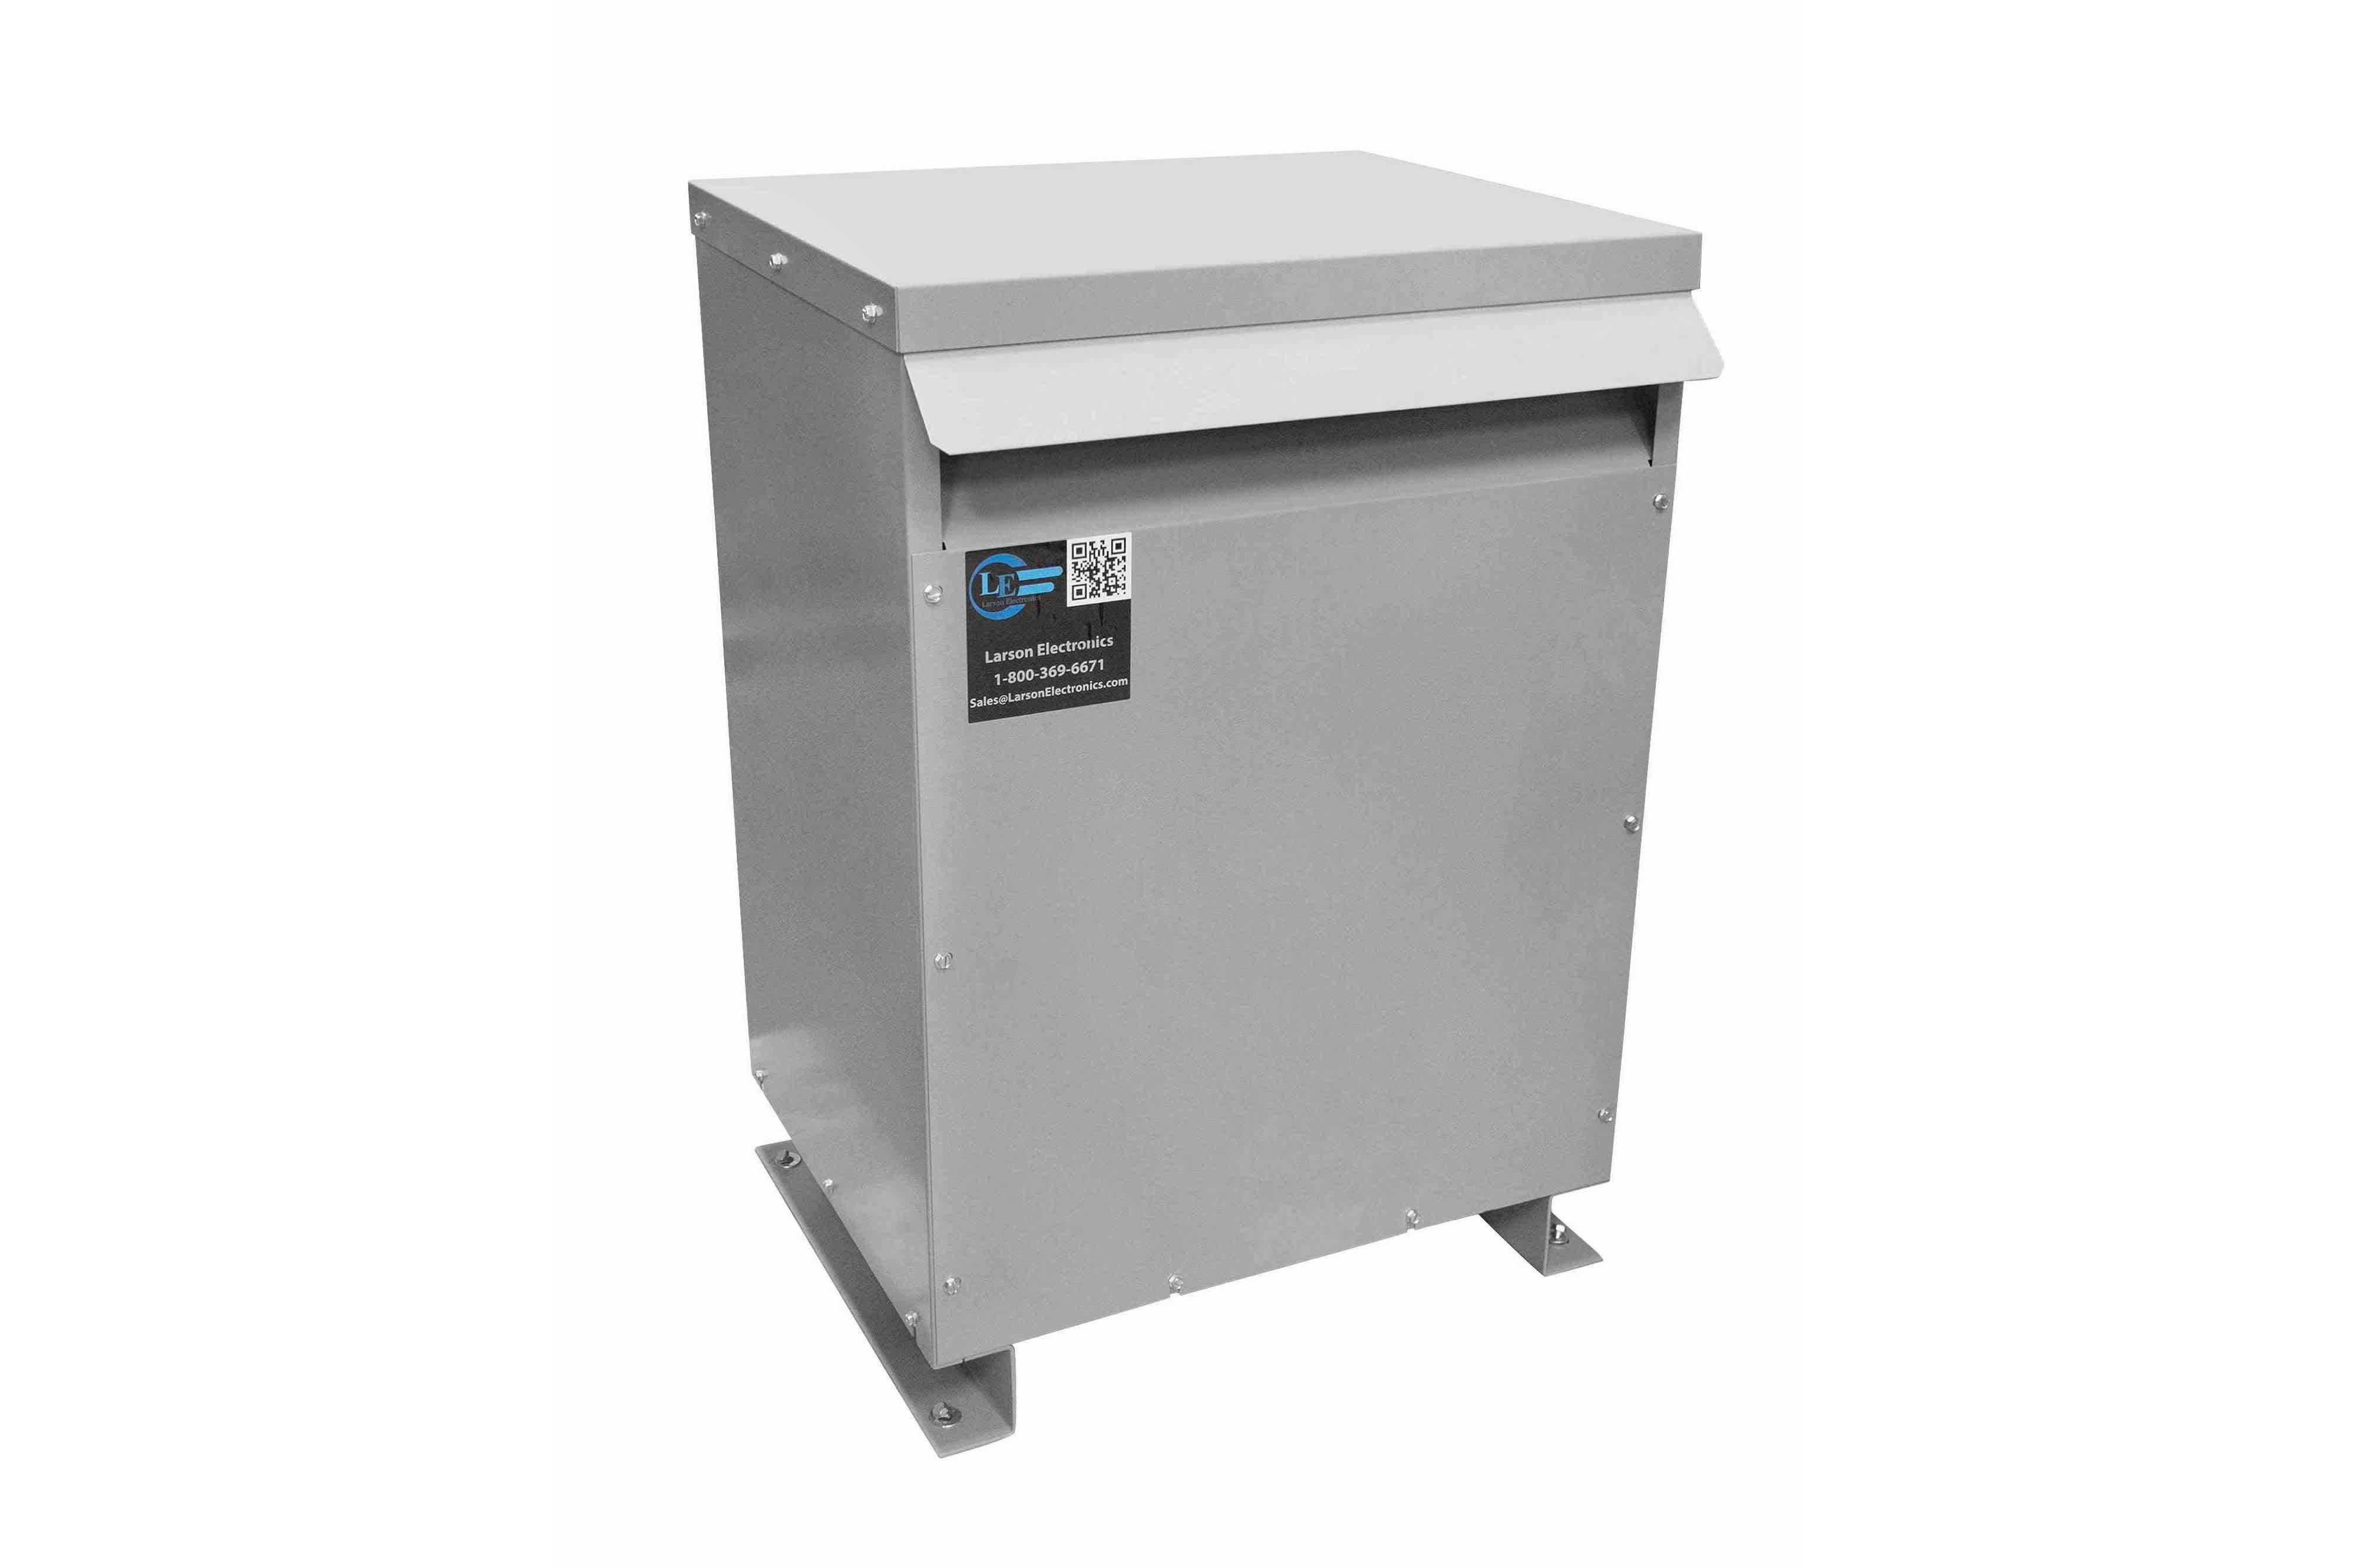 75 kVA 3PH Isolation Transformer, 440V Wye Primary, 240V Delta Secondary, N3R, Ventilated, 60 Hz